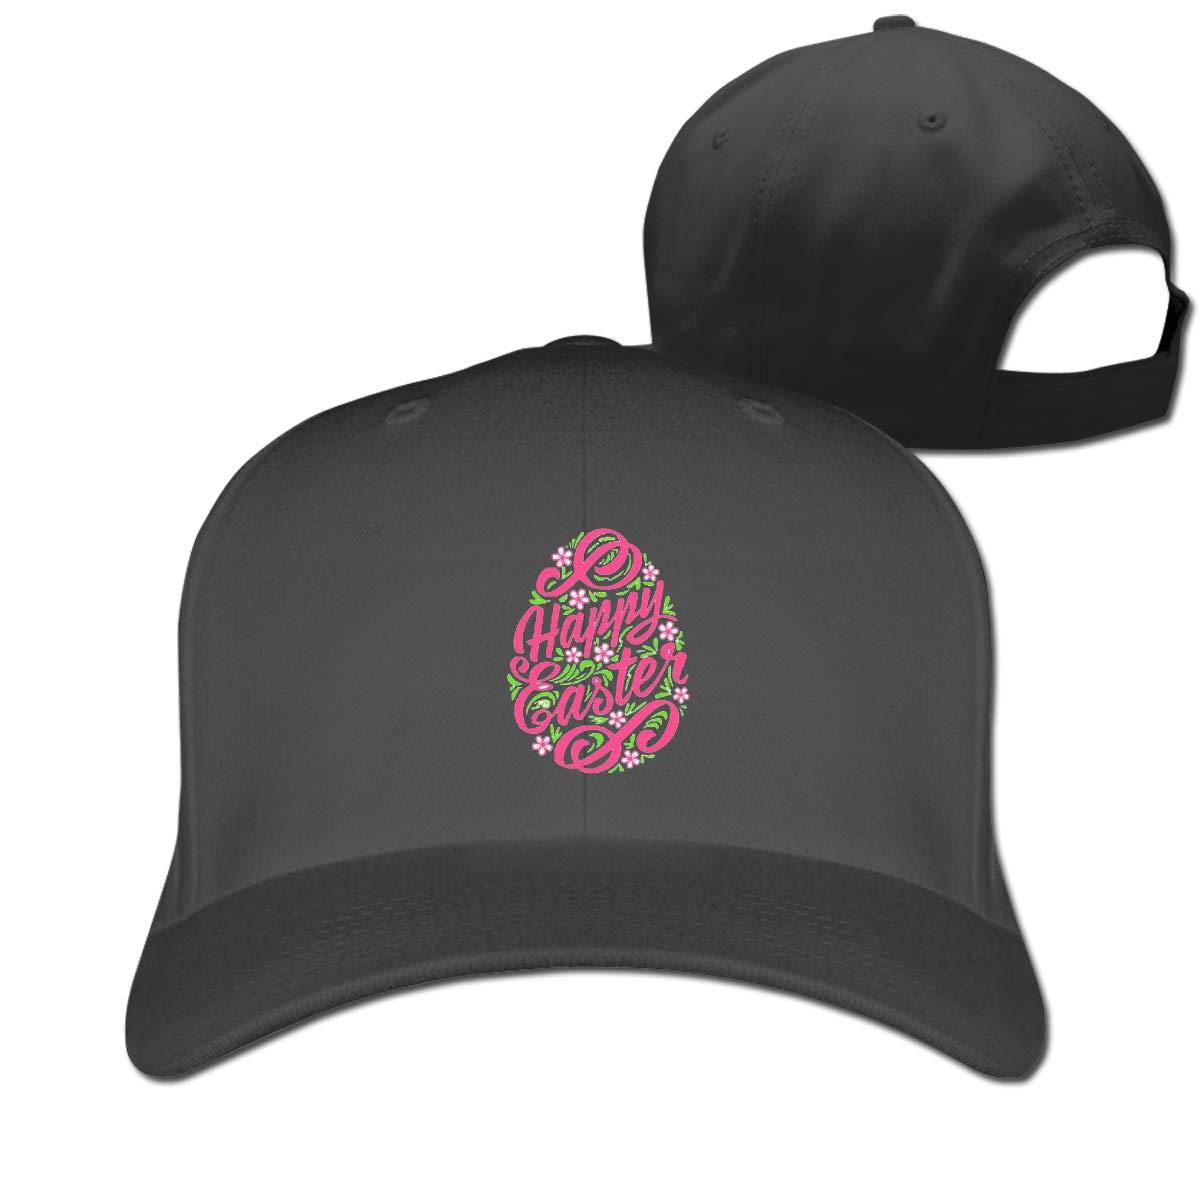 Happy Eastes Day Fashion Adjustable Cotton Baseball Caps Trucker Driver Hat Outdoor Cap Black